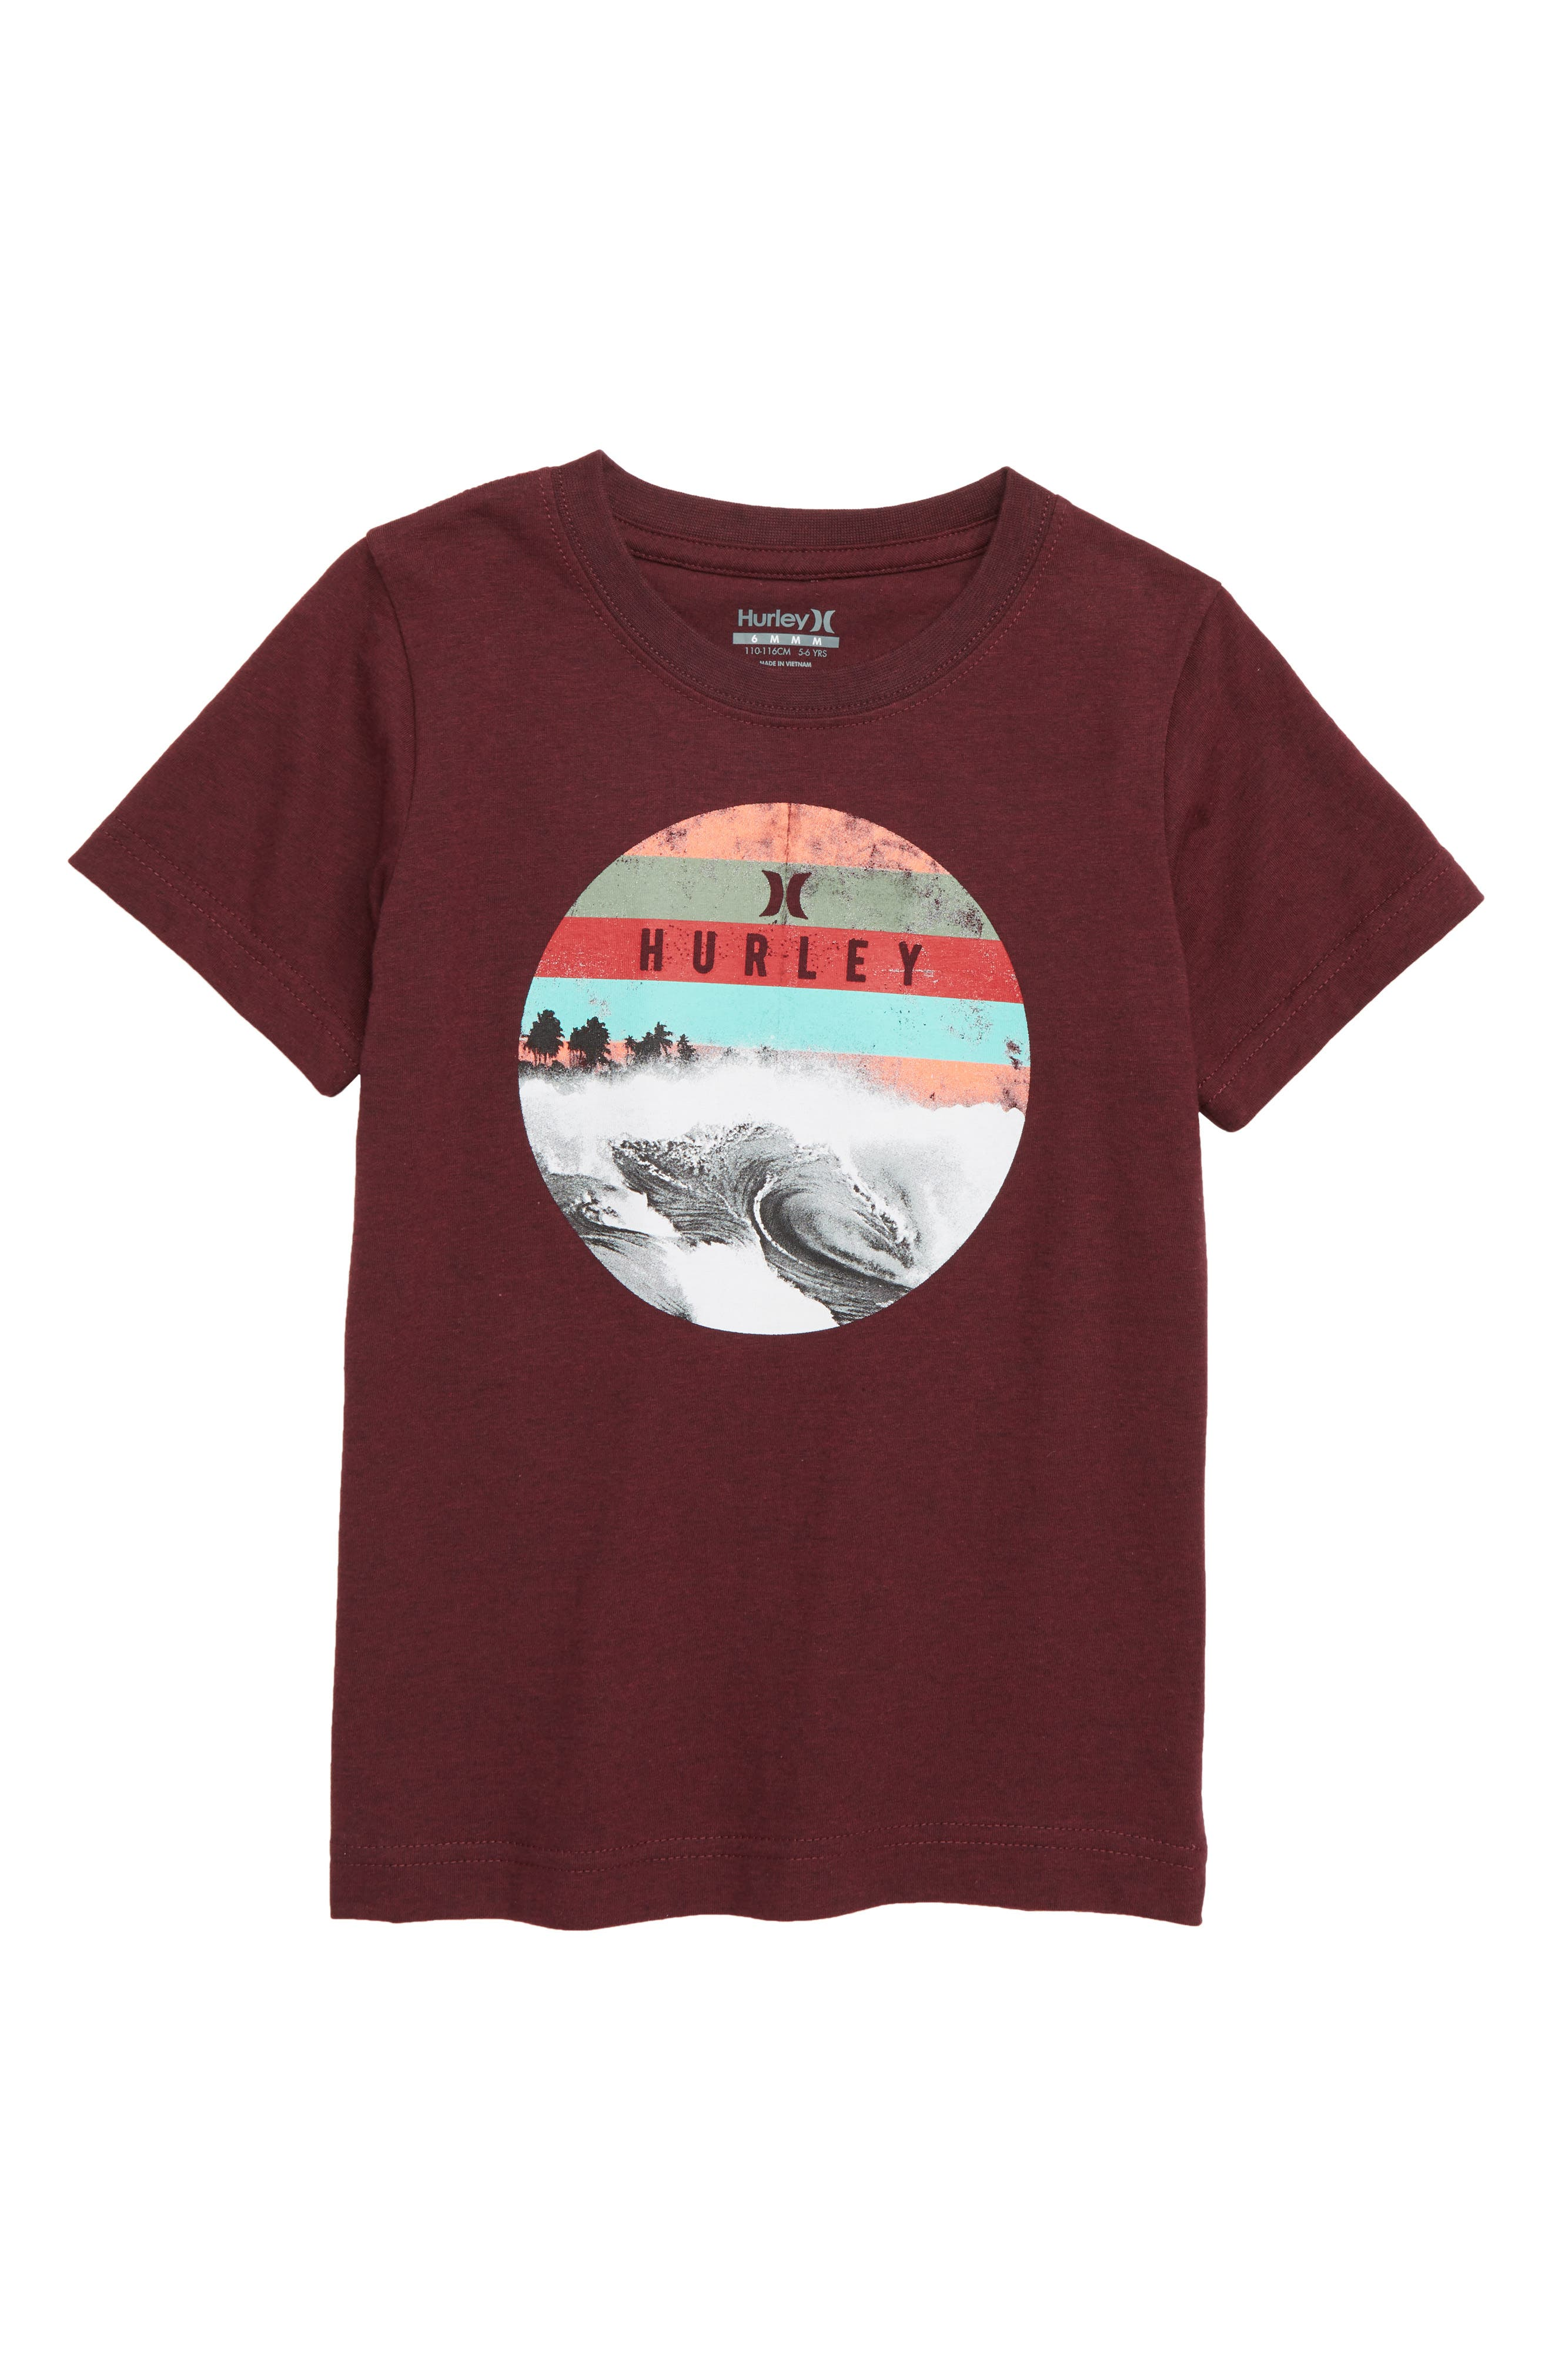 Dusk T-Shirt,                             Main thumbnail 1, color,                             DEEP MAROON HEATHER